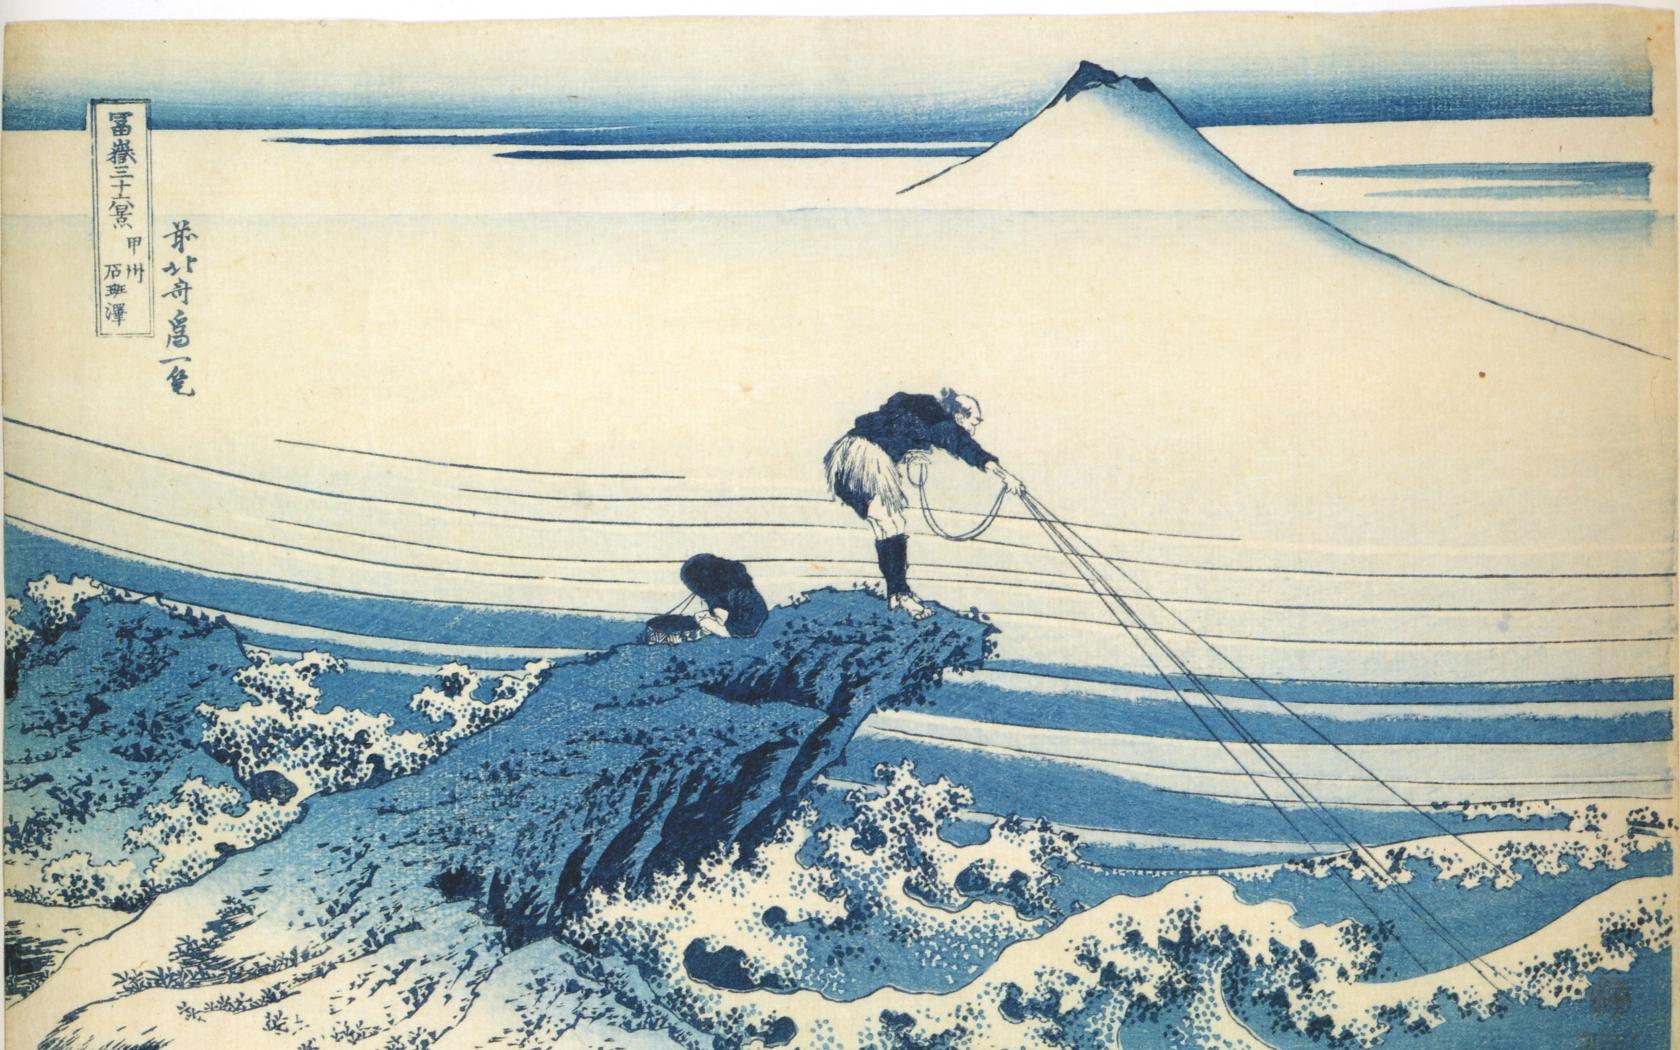 katsushika hokusai thirtysix views of mount fuji 5000x3500 wallpaper 1680x1050